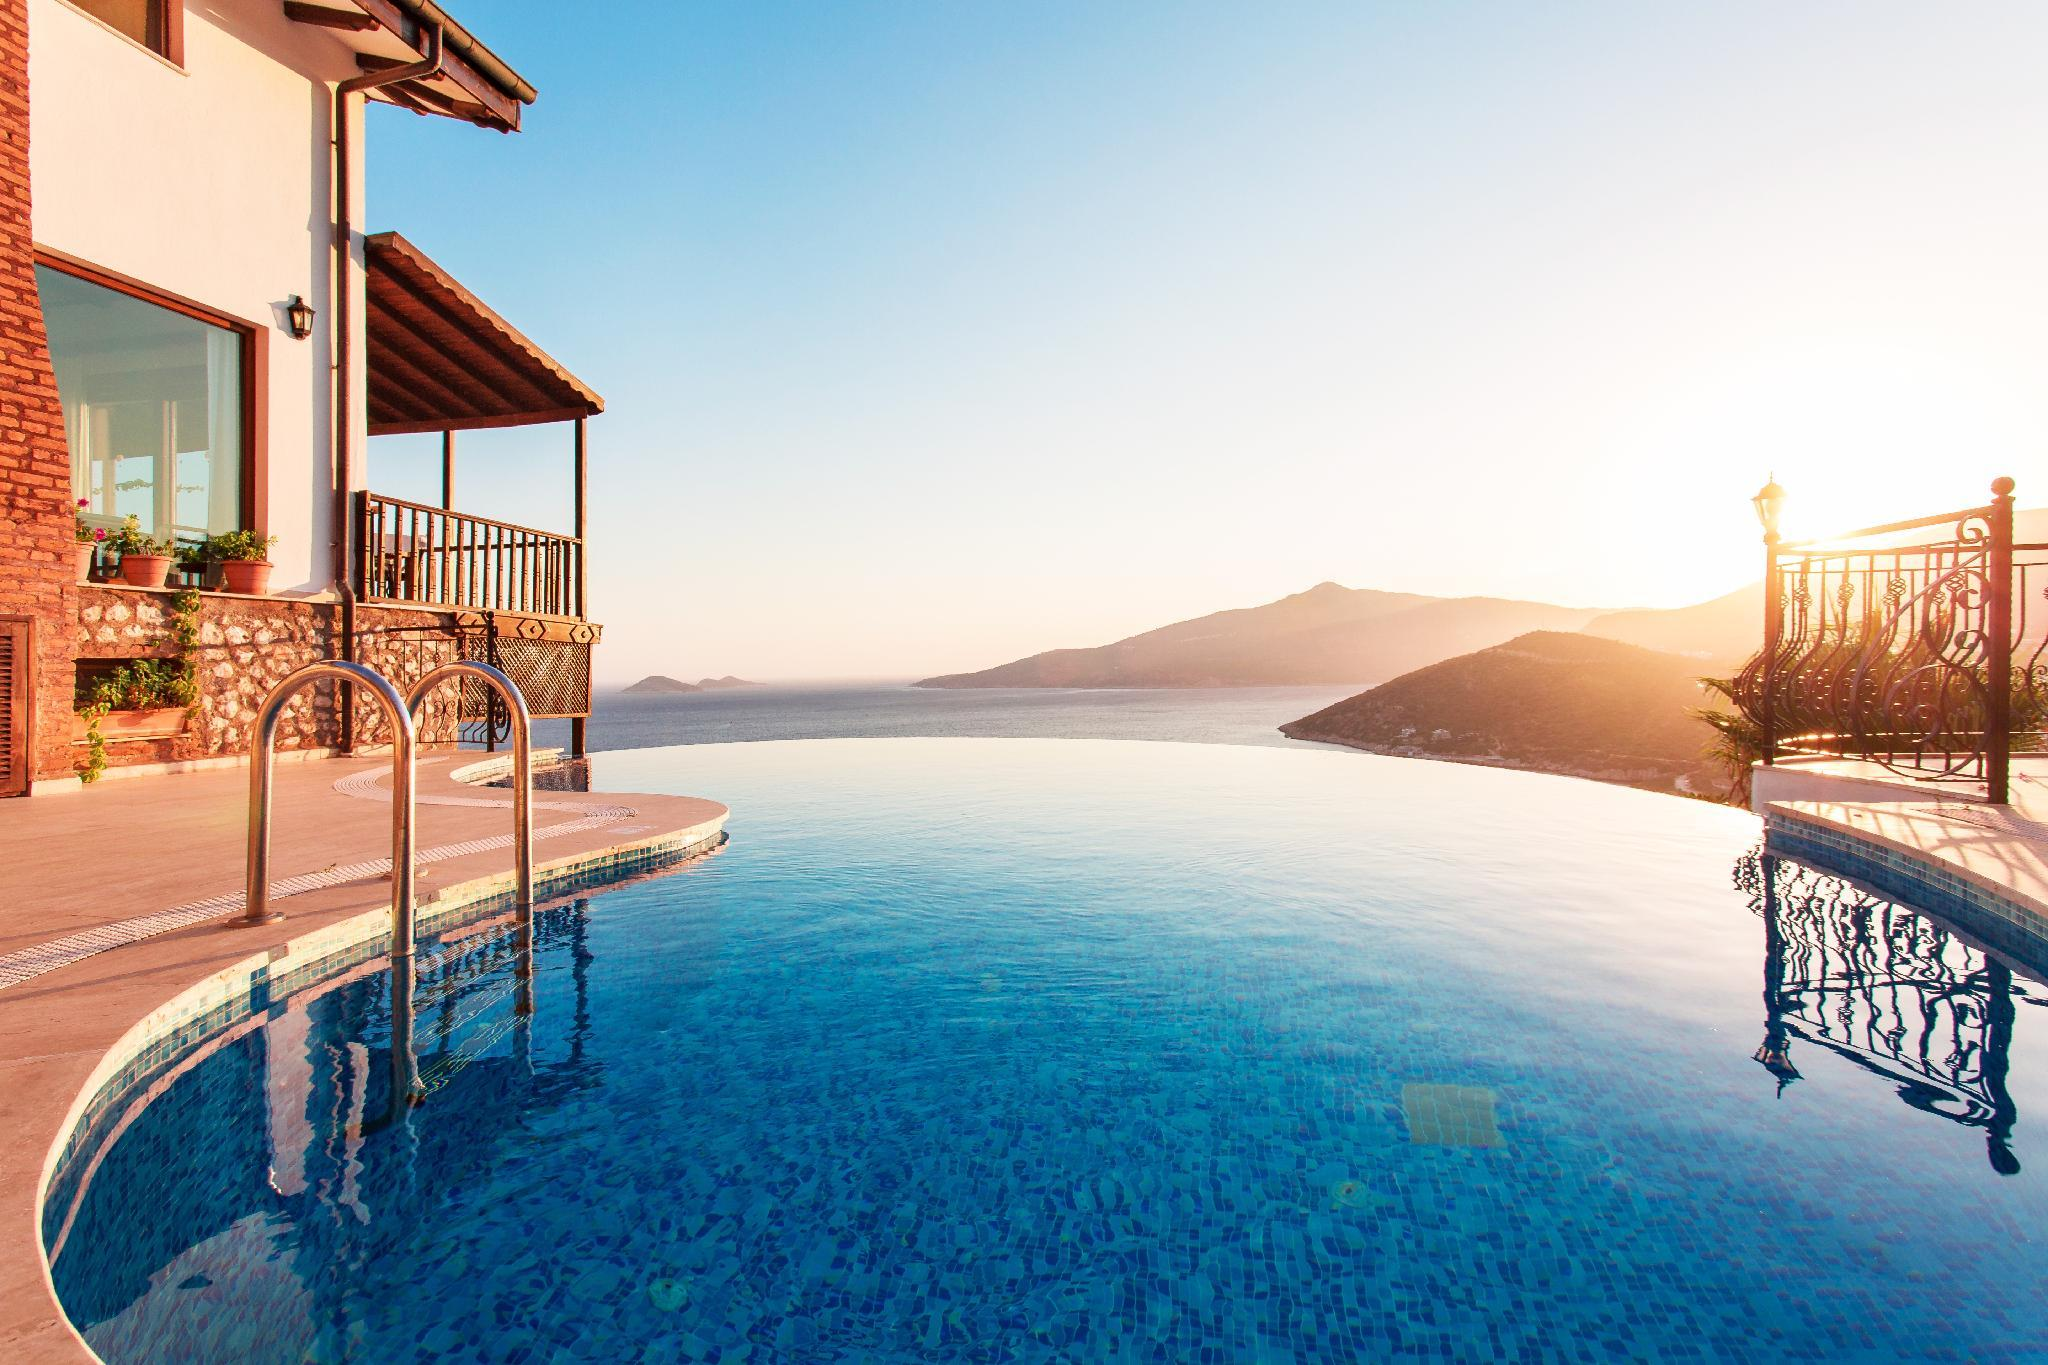 Luxurious Mediterranean Villa With Infinity Pool